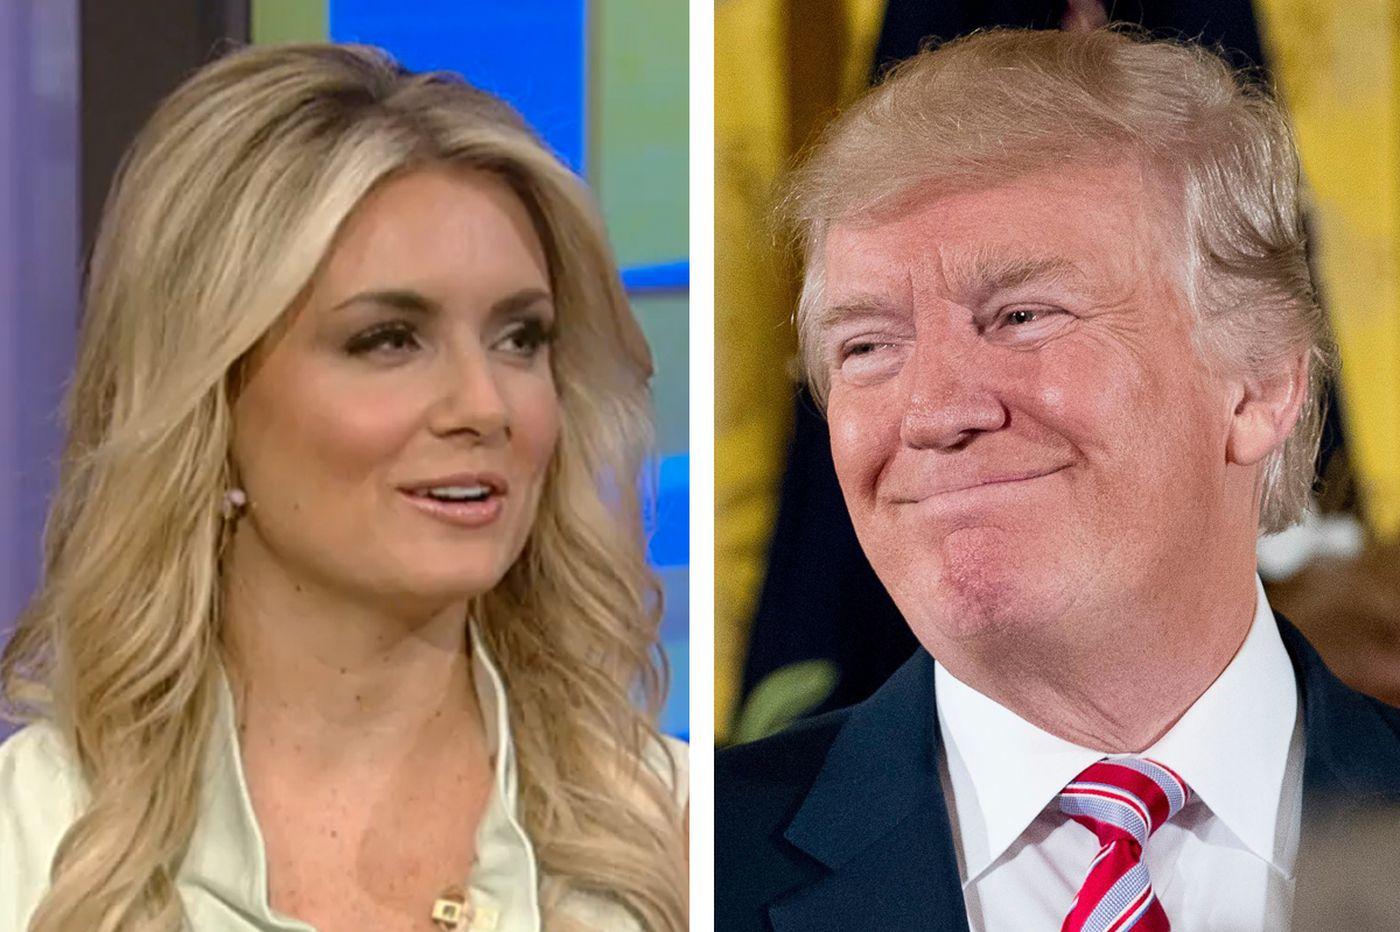 Ex-CSN Philly host Jillian Mele ends up on Trump's Twitter account